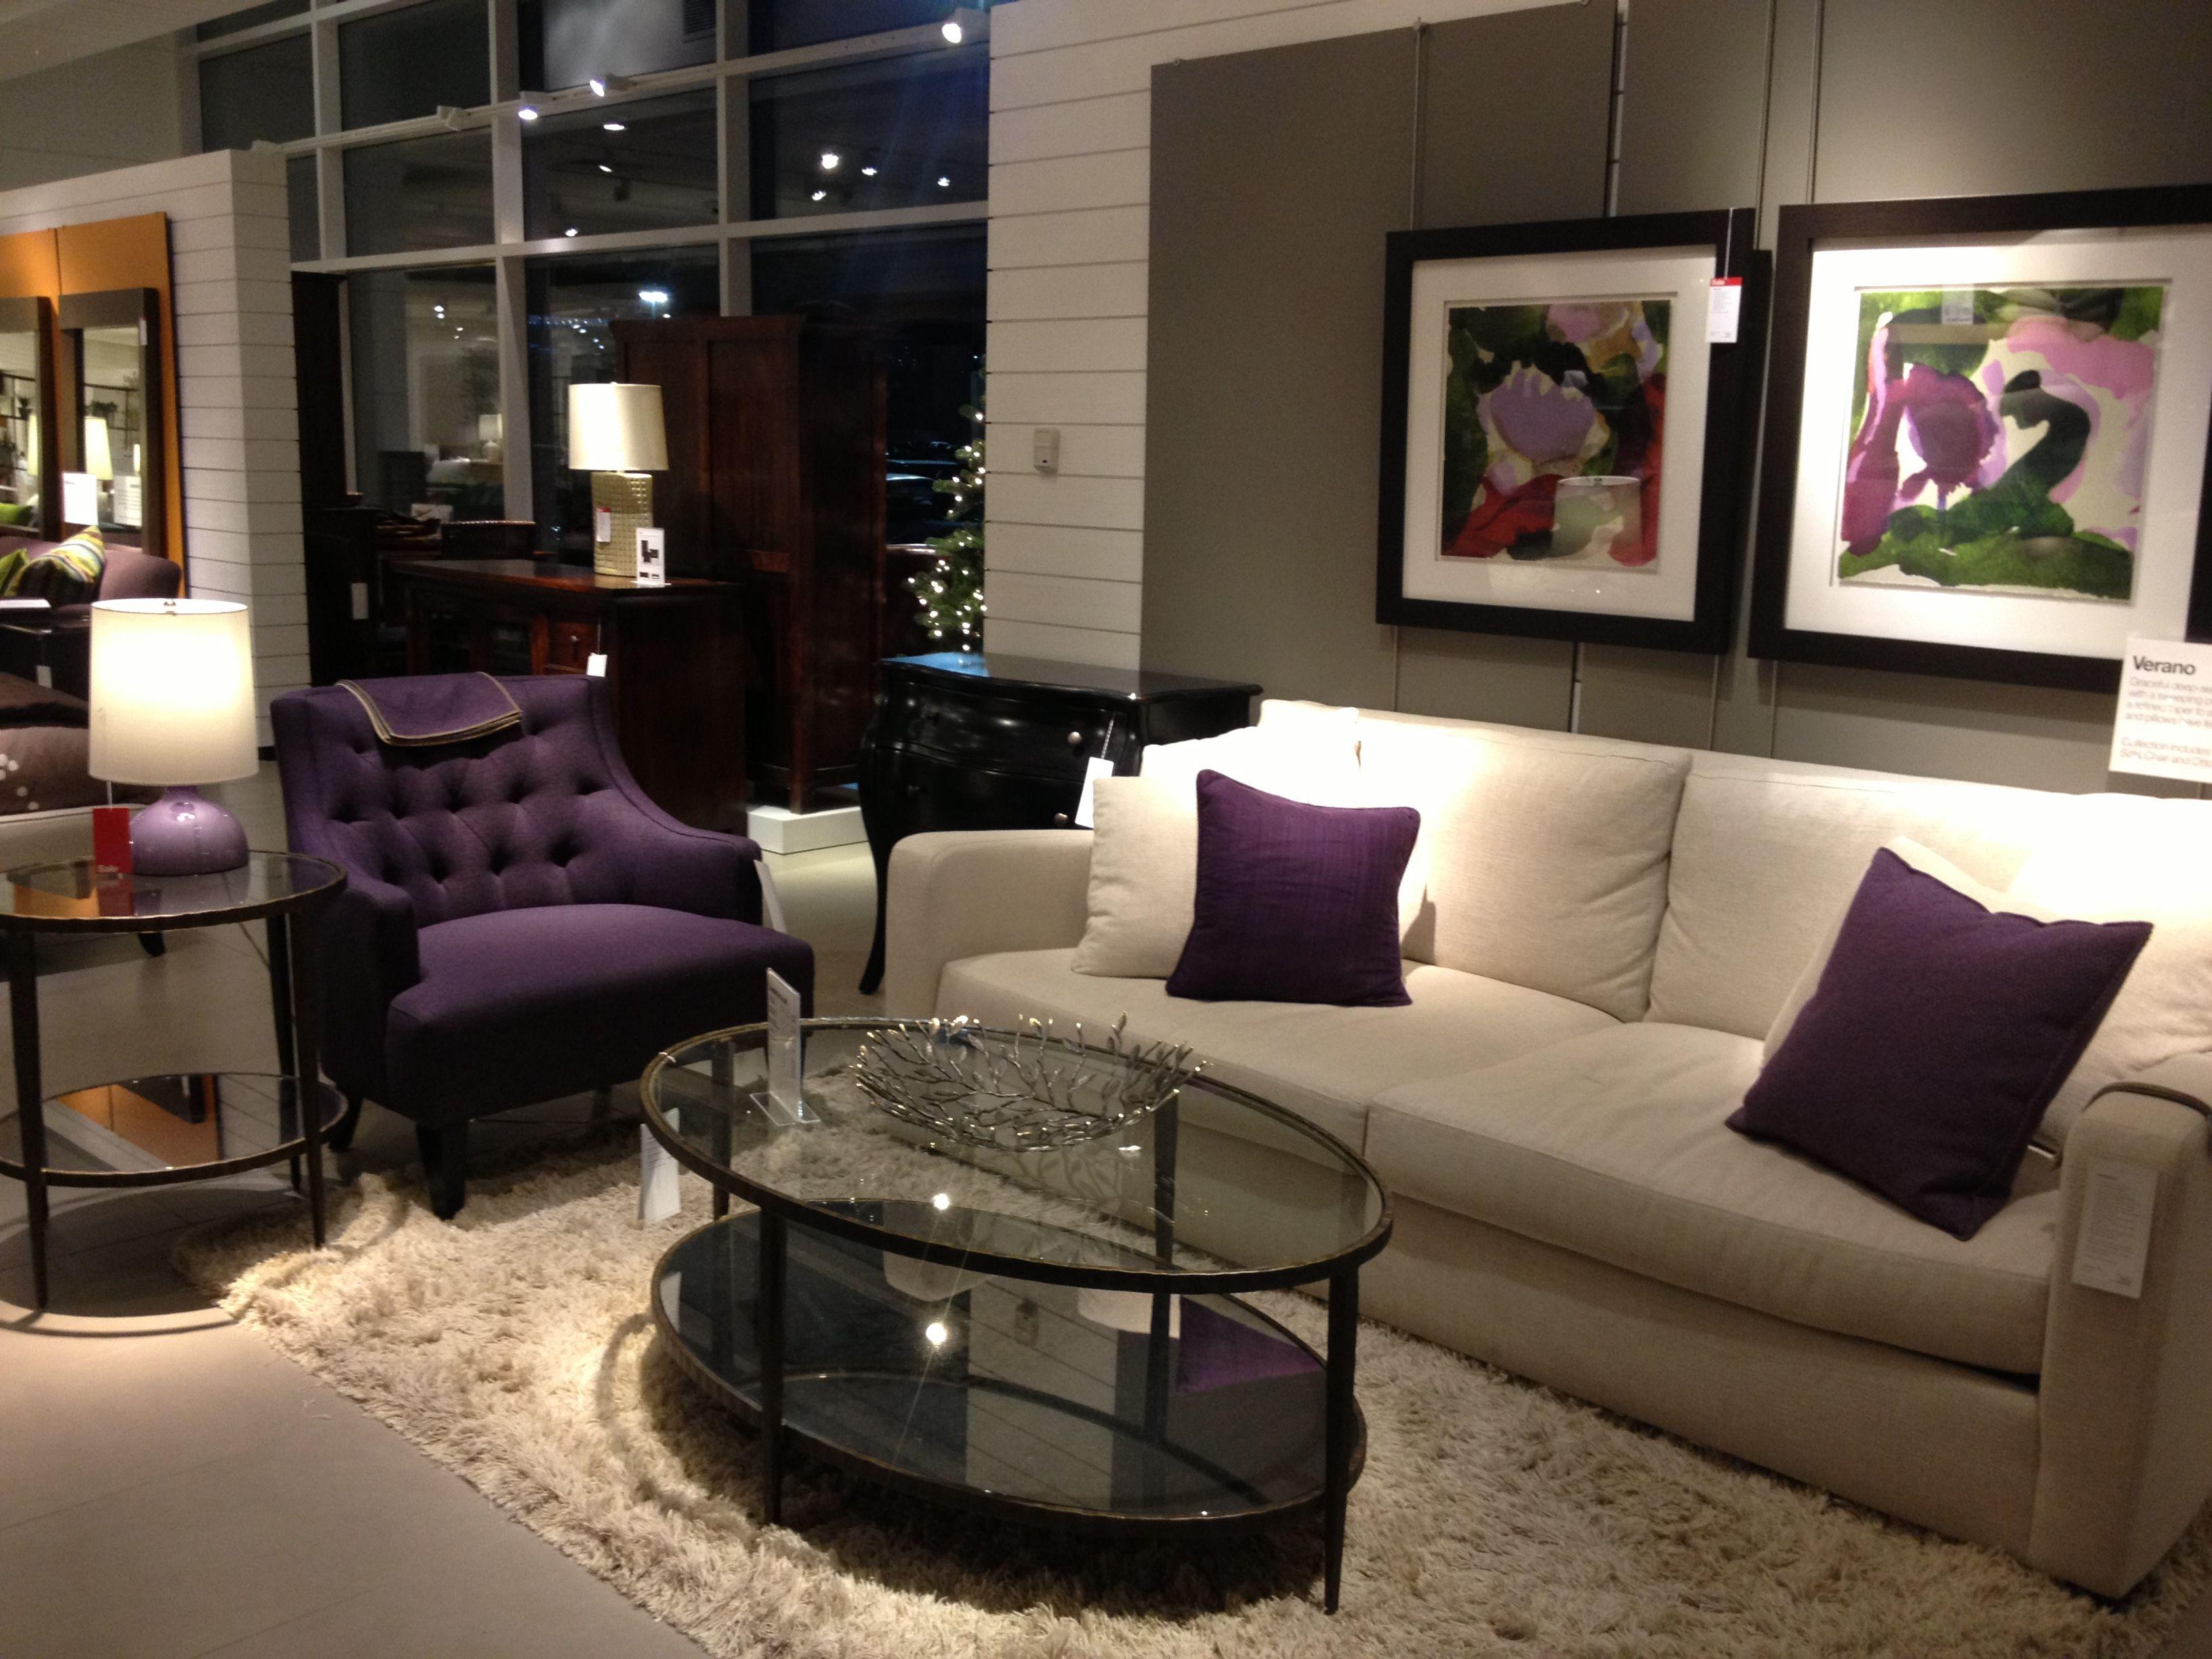 Purple Crate & Barrel Living Room Set!   For the Home   Pinterest ...